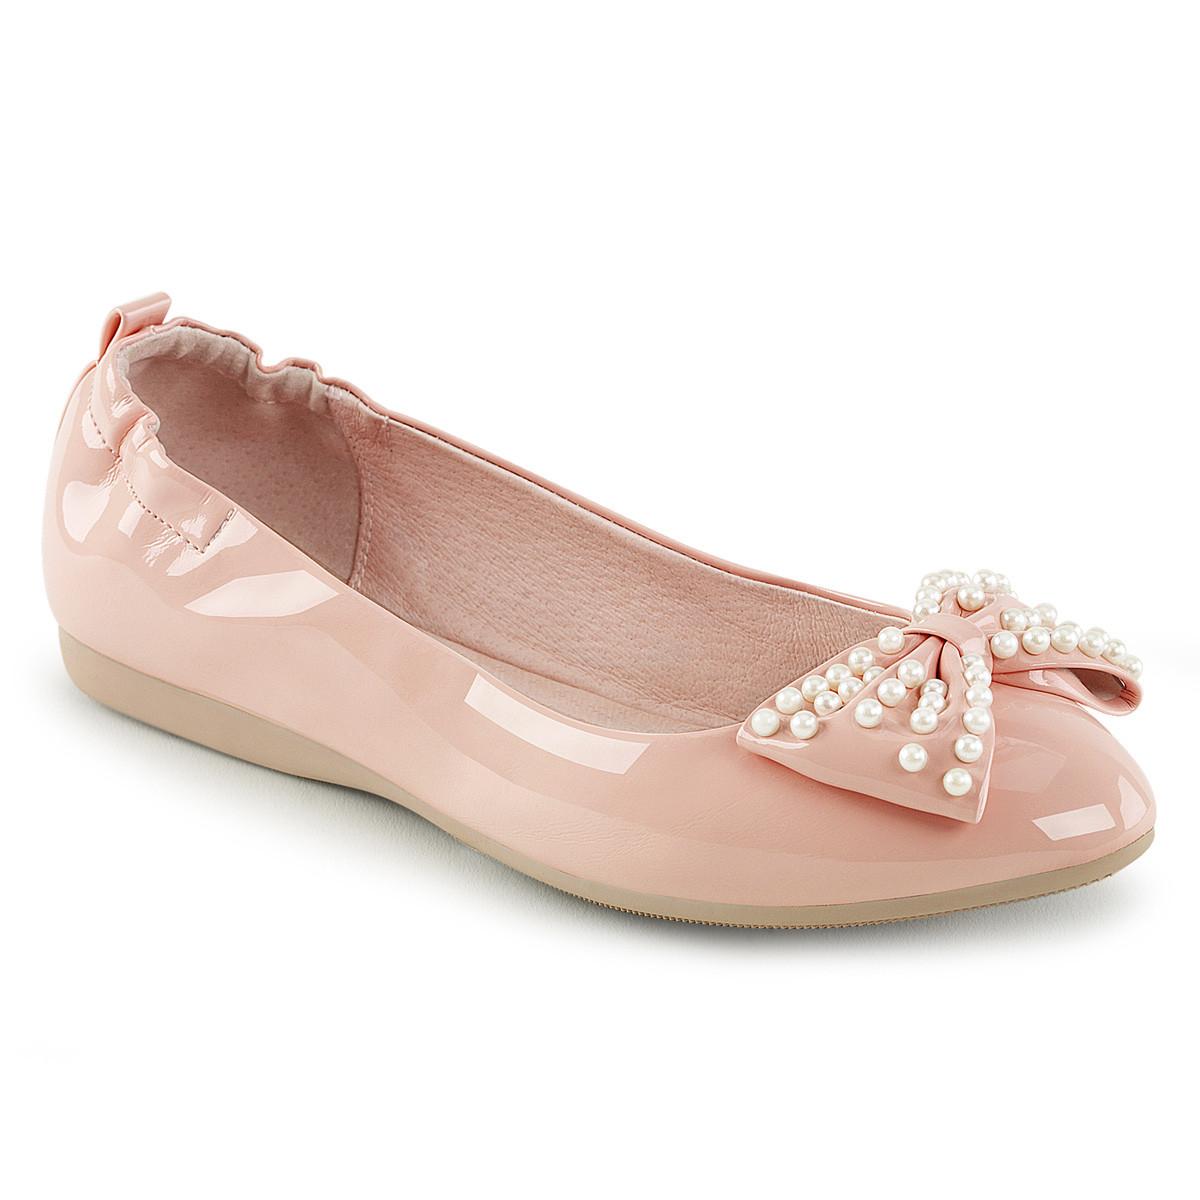 Ballerinas - IVY 09 ° Damen Ballerina ° Babypink ° Lack ° Pin Up Couture  - Onlineshop RedSixty